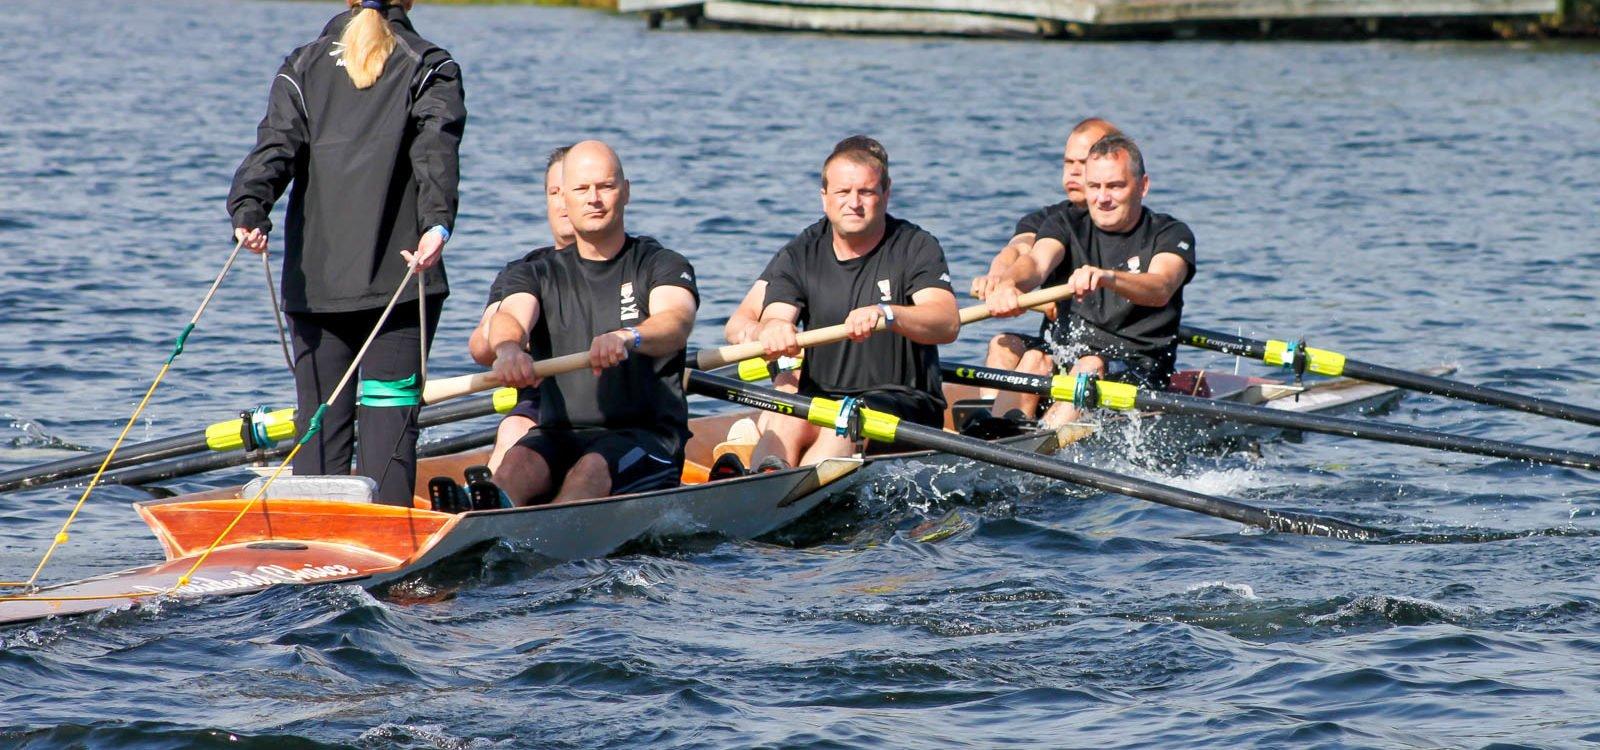 Rowing on Regatta Day